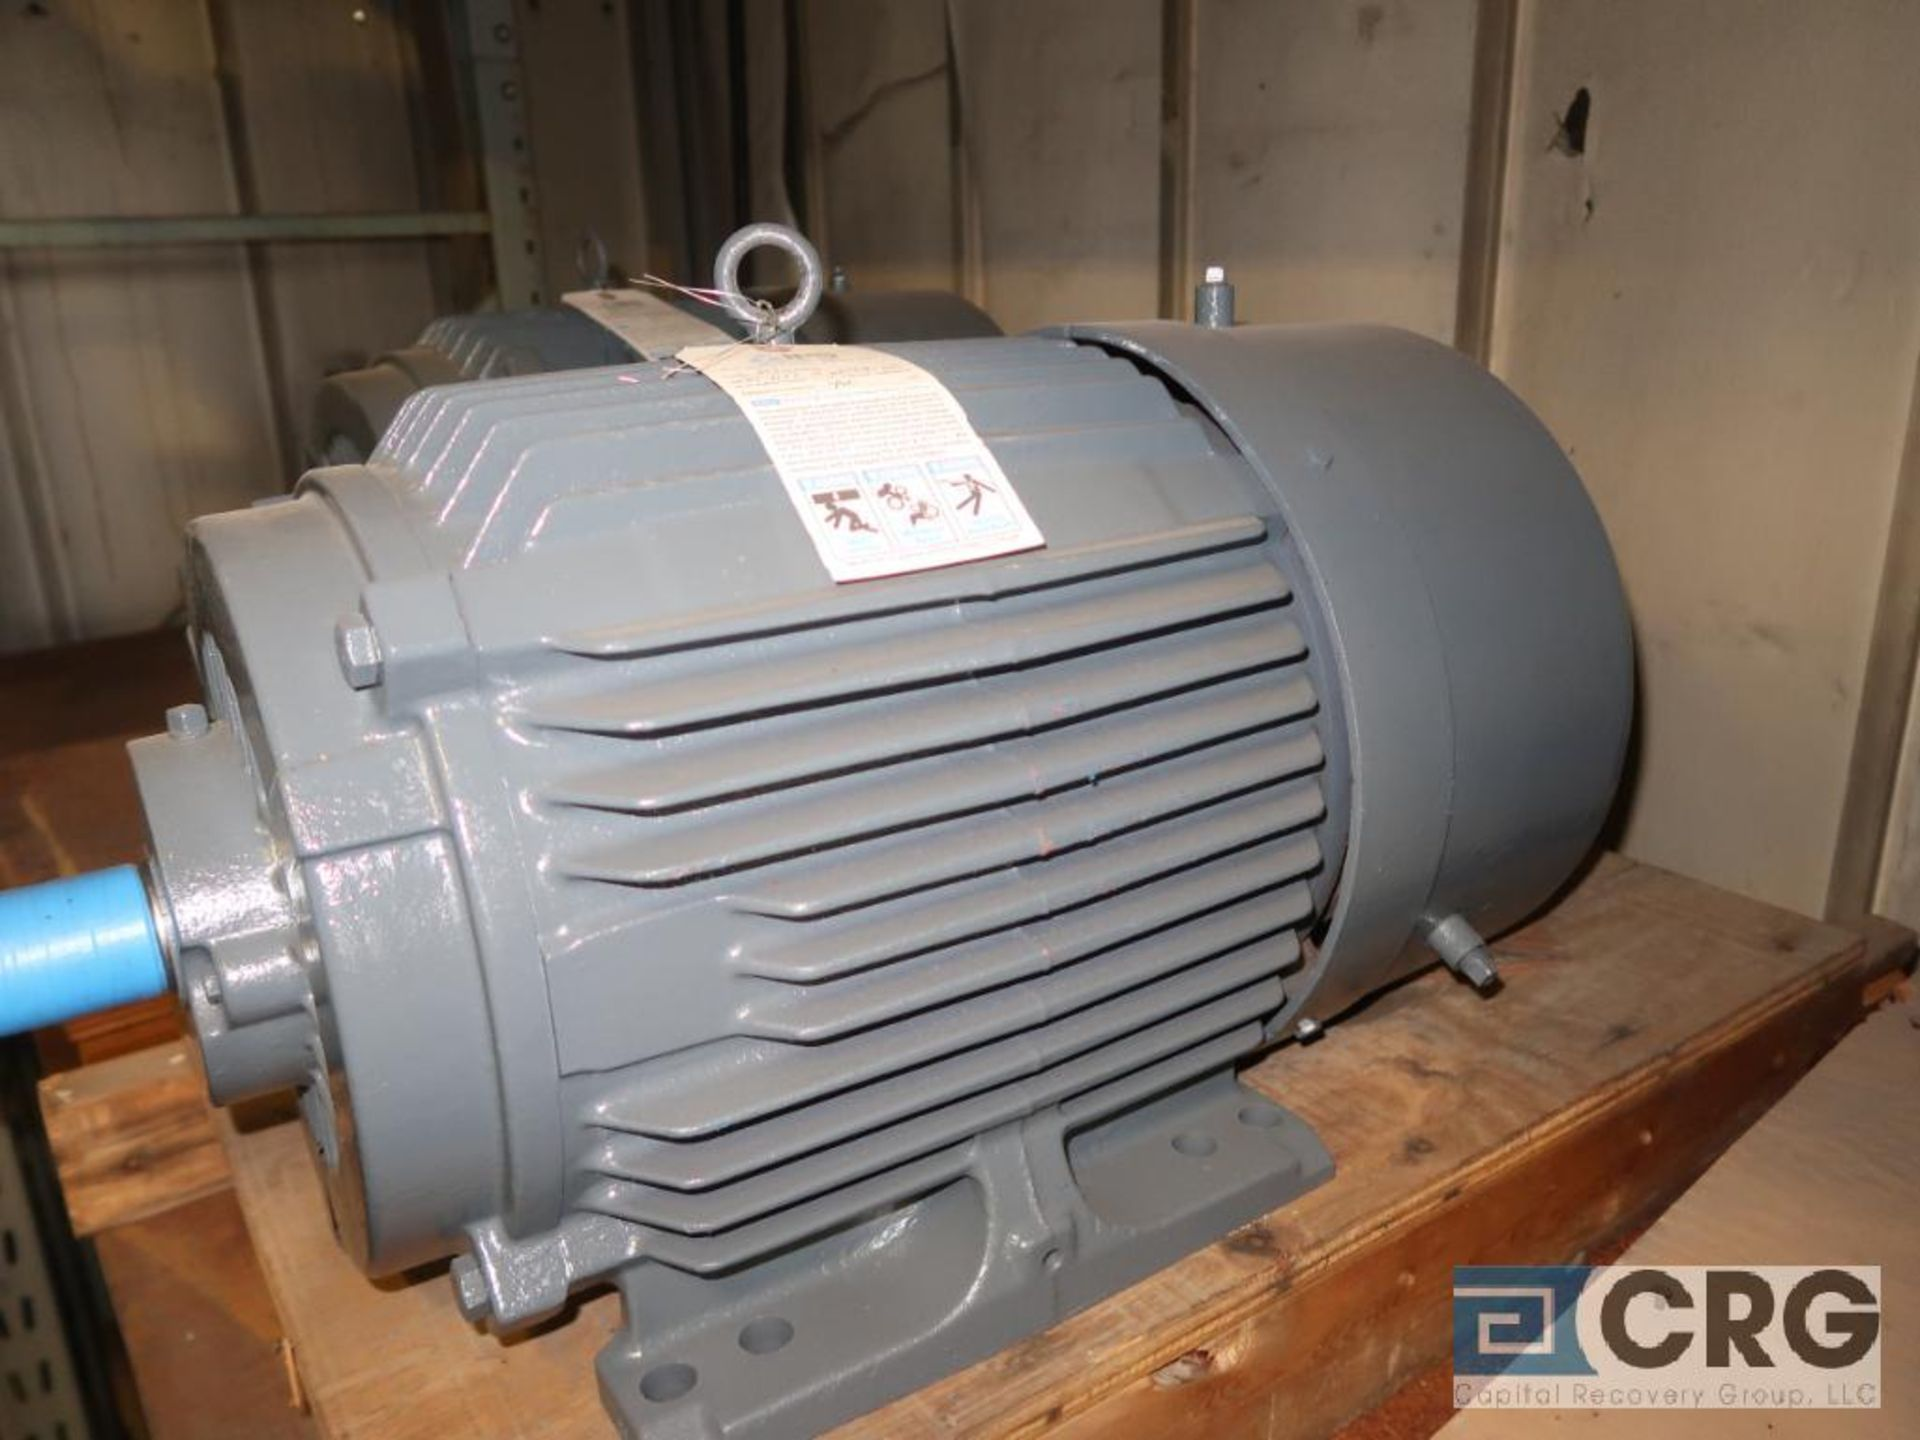 Lot of (3) assorted 25 HP motors (Motor Building) - Image 2 of 3